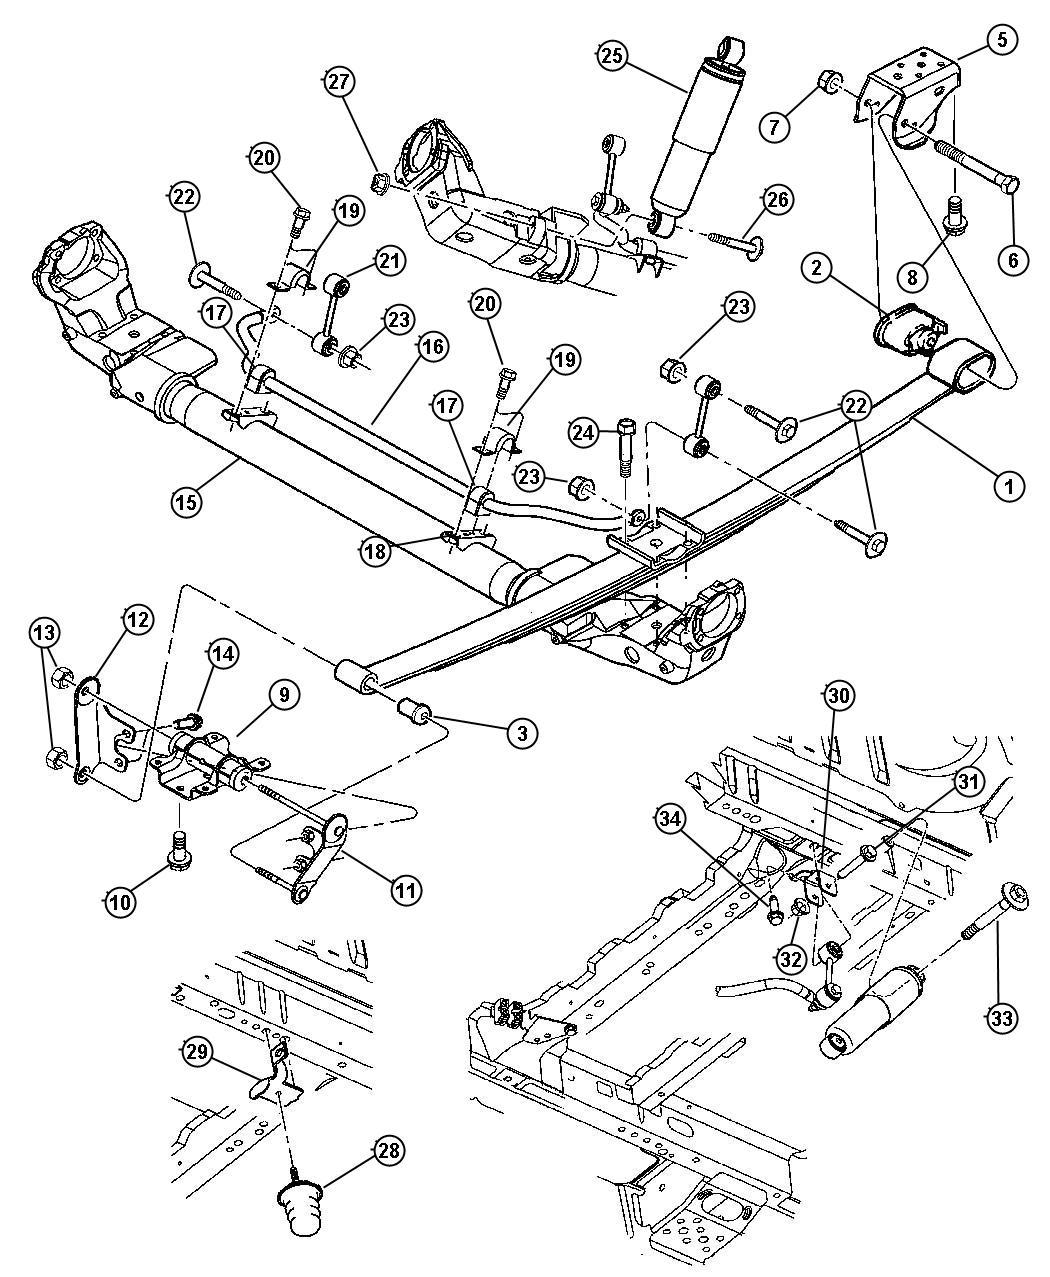 Chrysler Crossfire Parts Diagram. Chrysler. Auto Wiring